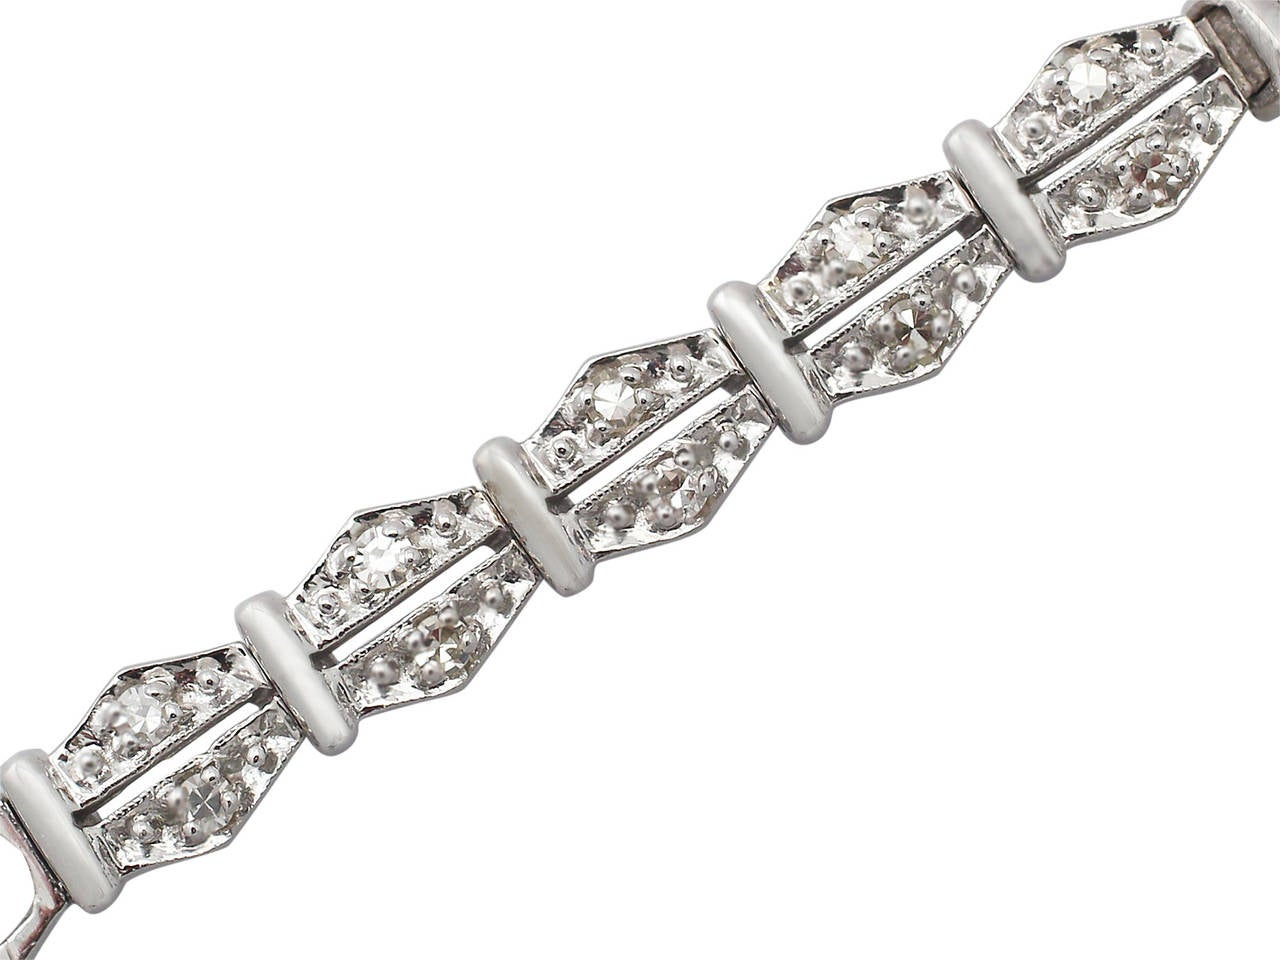 1950s 2.26 carat Diamond Platinum and White Gold Longines Cocktail Watch 5